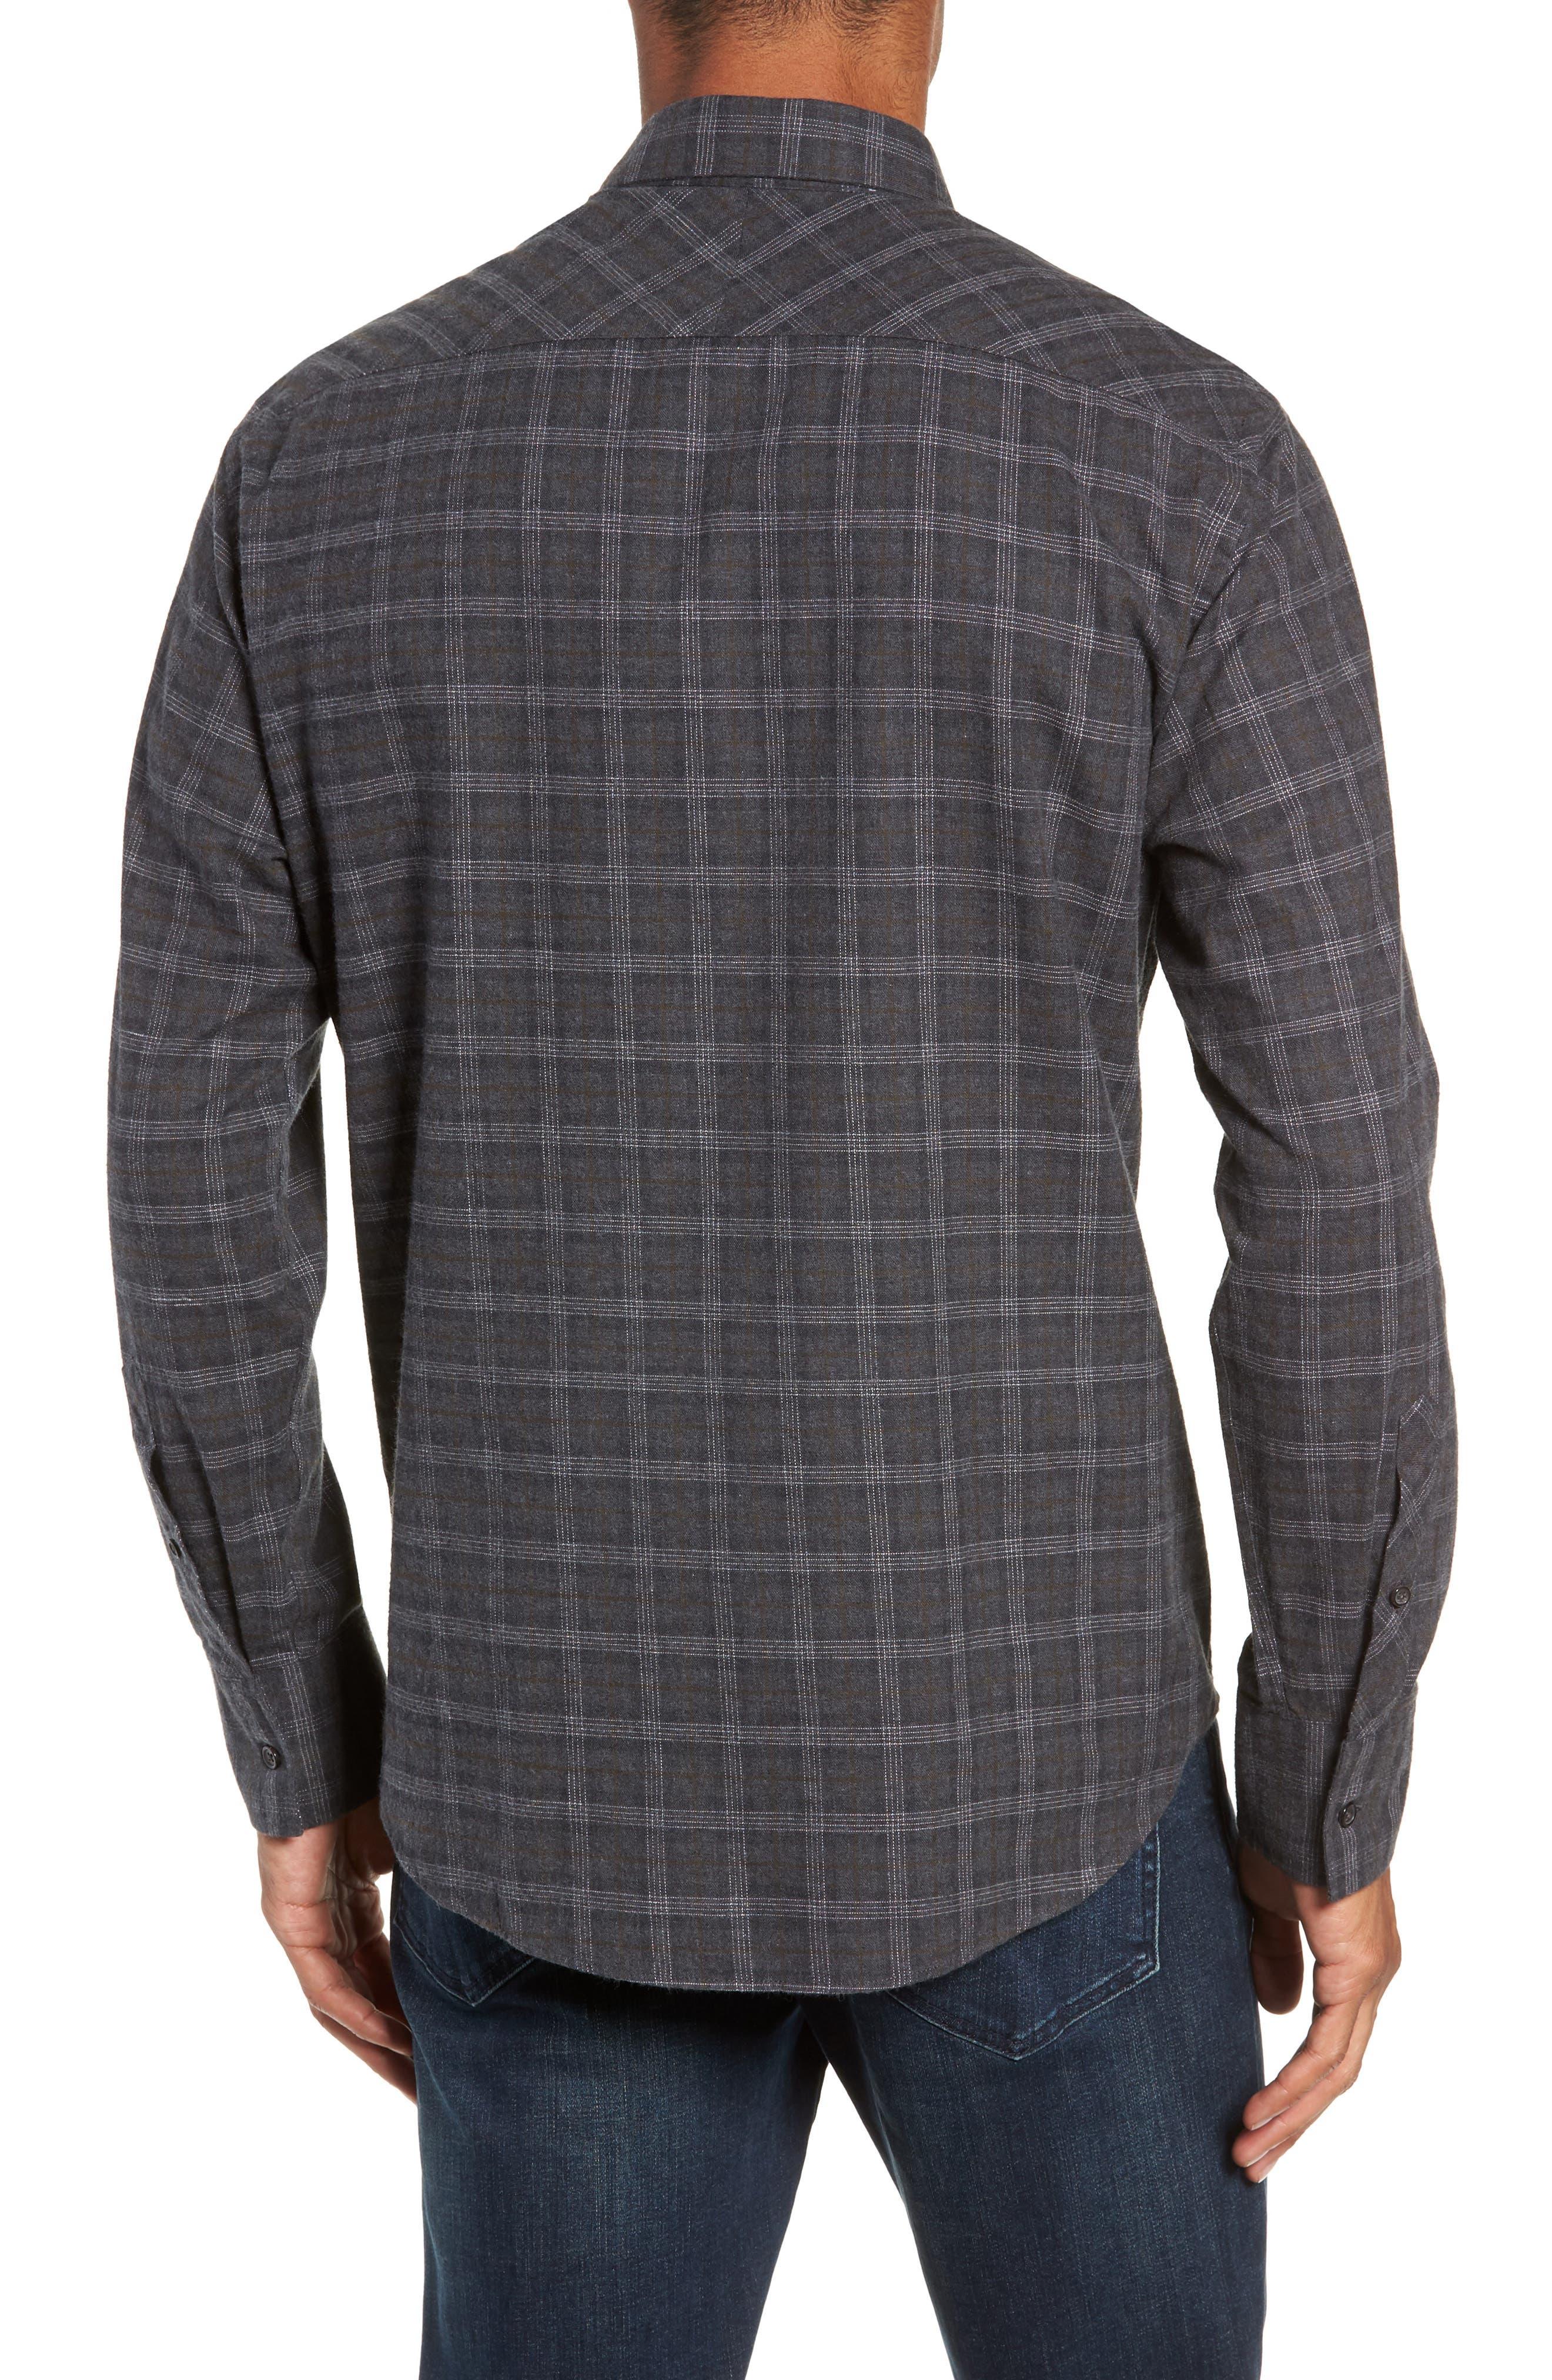 Walland Regular Fit Plaid Sport Shirt,                             Alternate thumbnail 2, color,                             DARK GREY